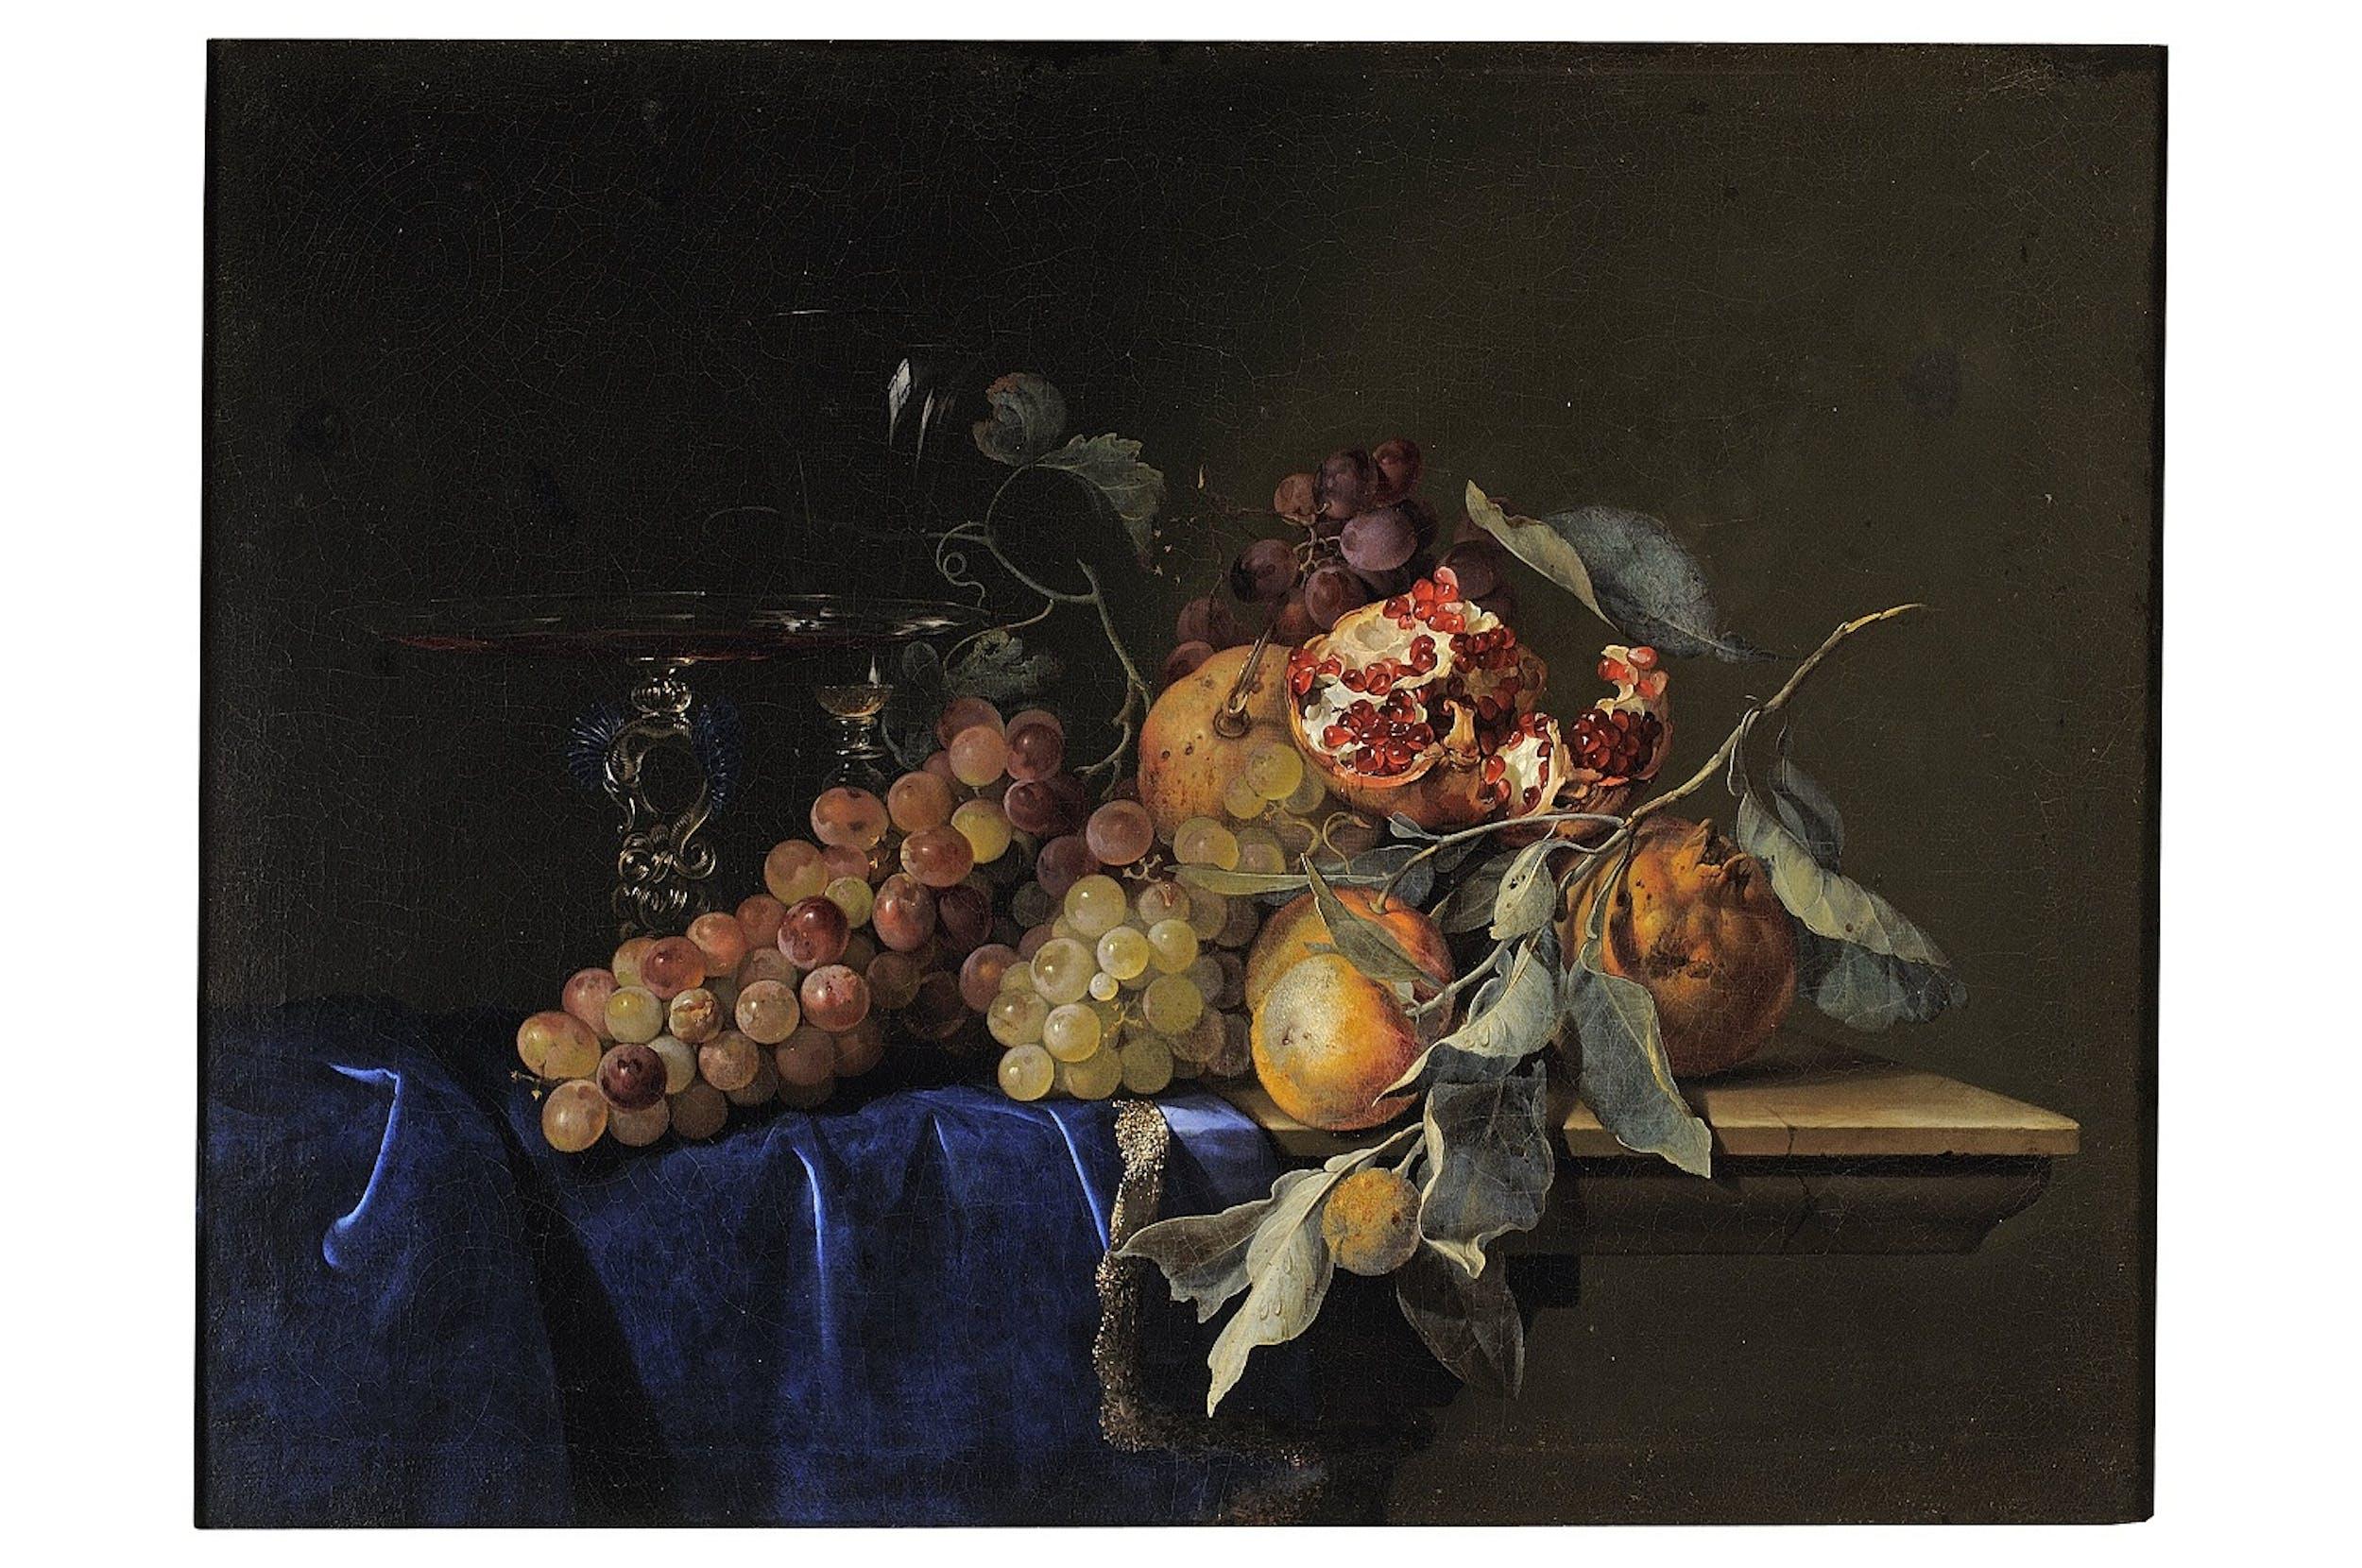 Willelm Van Aelst, Natura morta con frutta